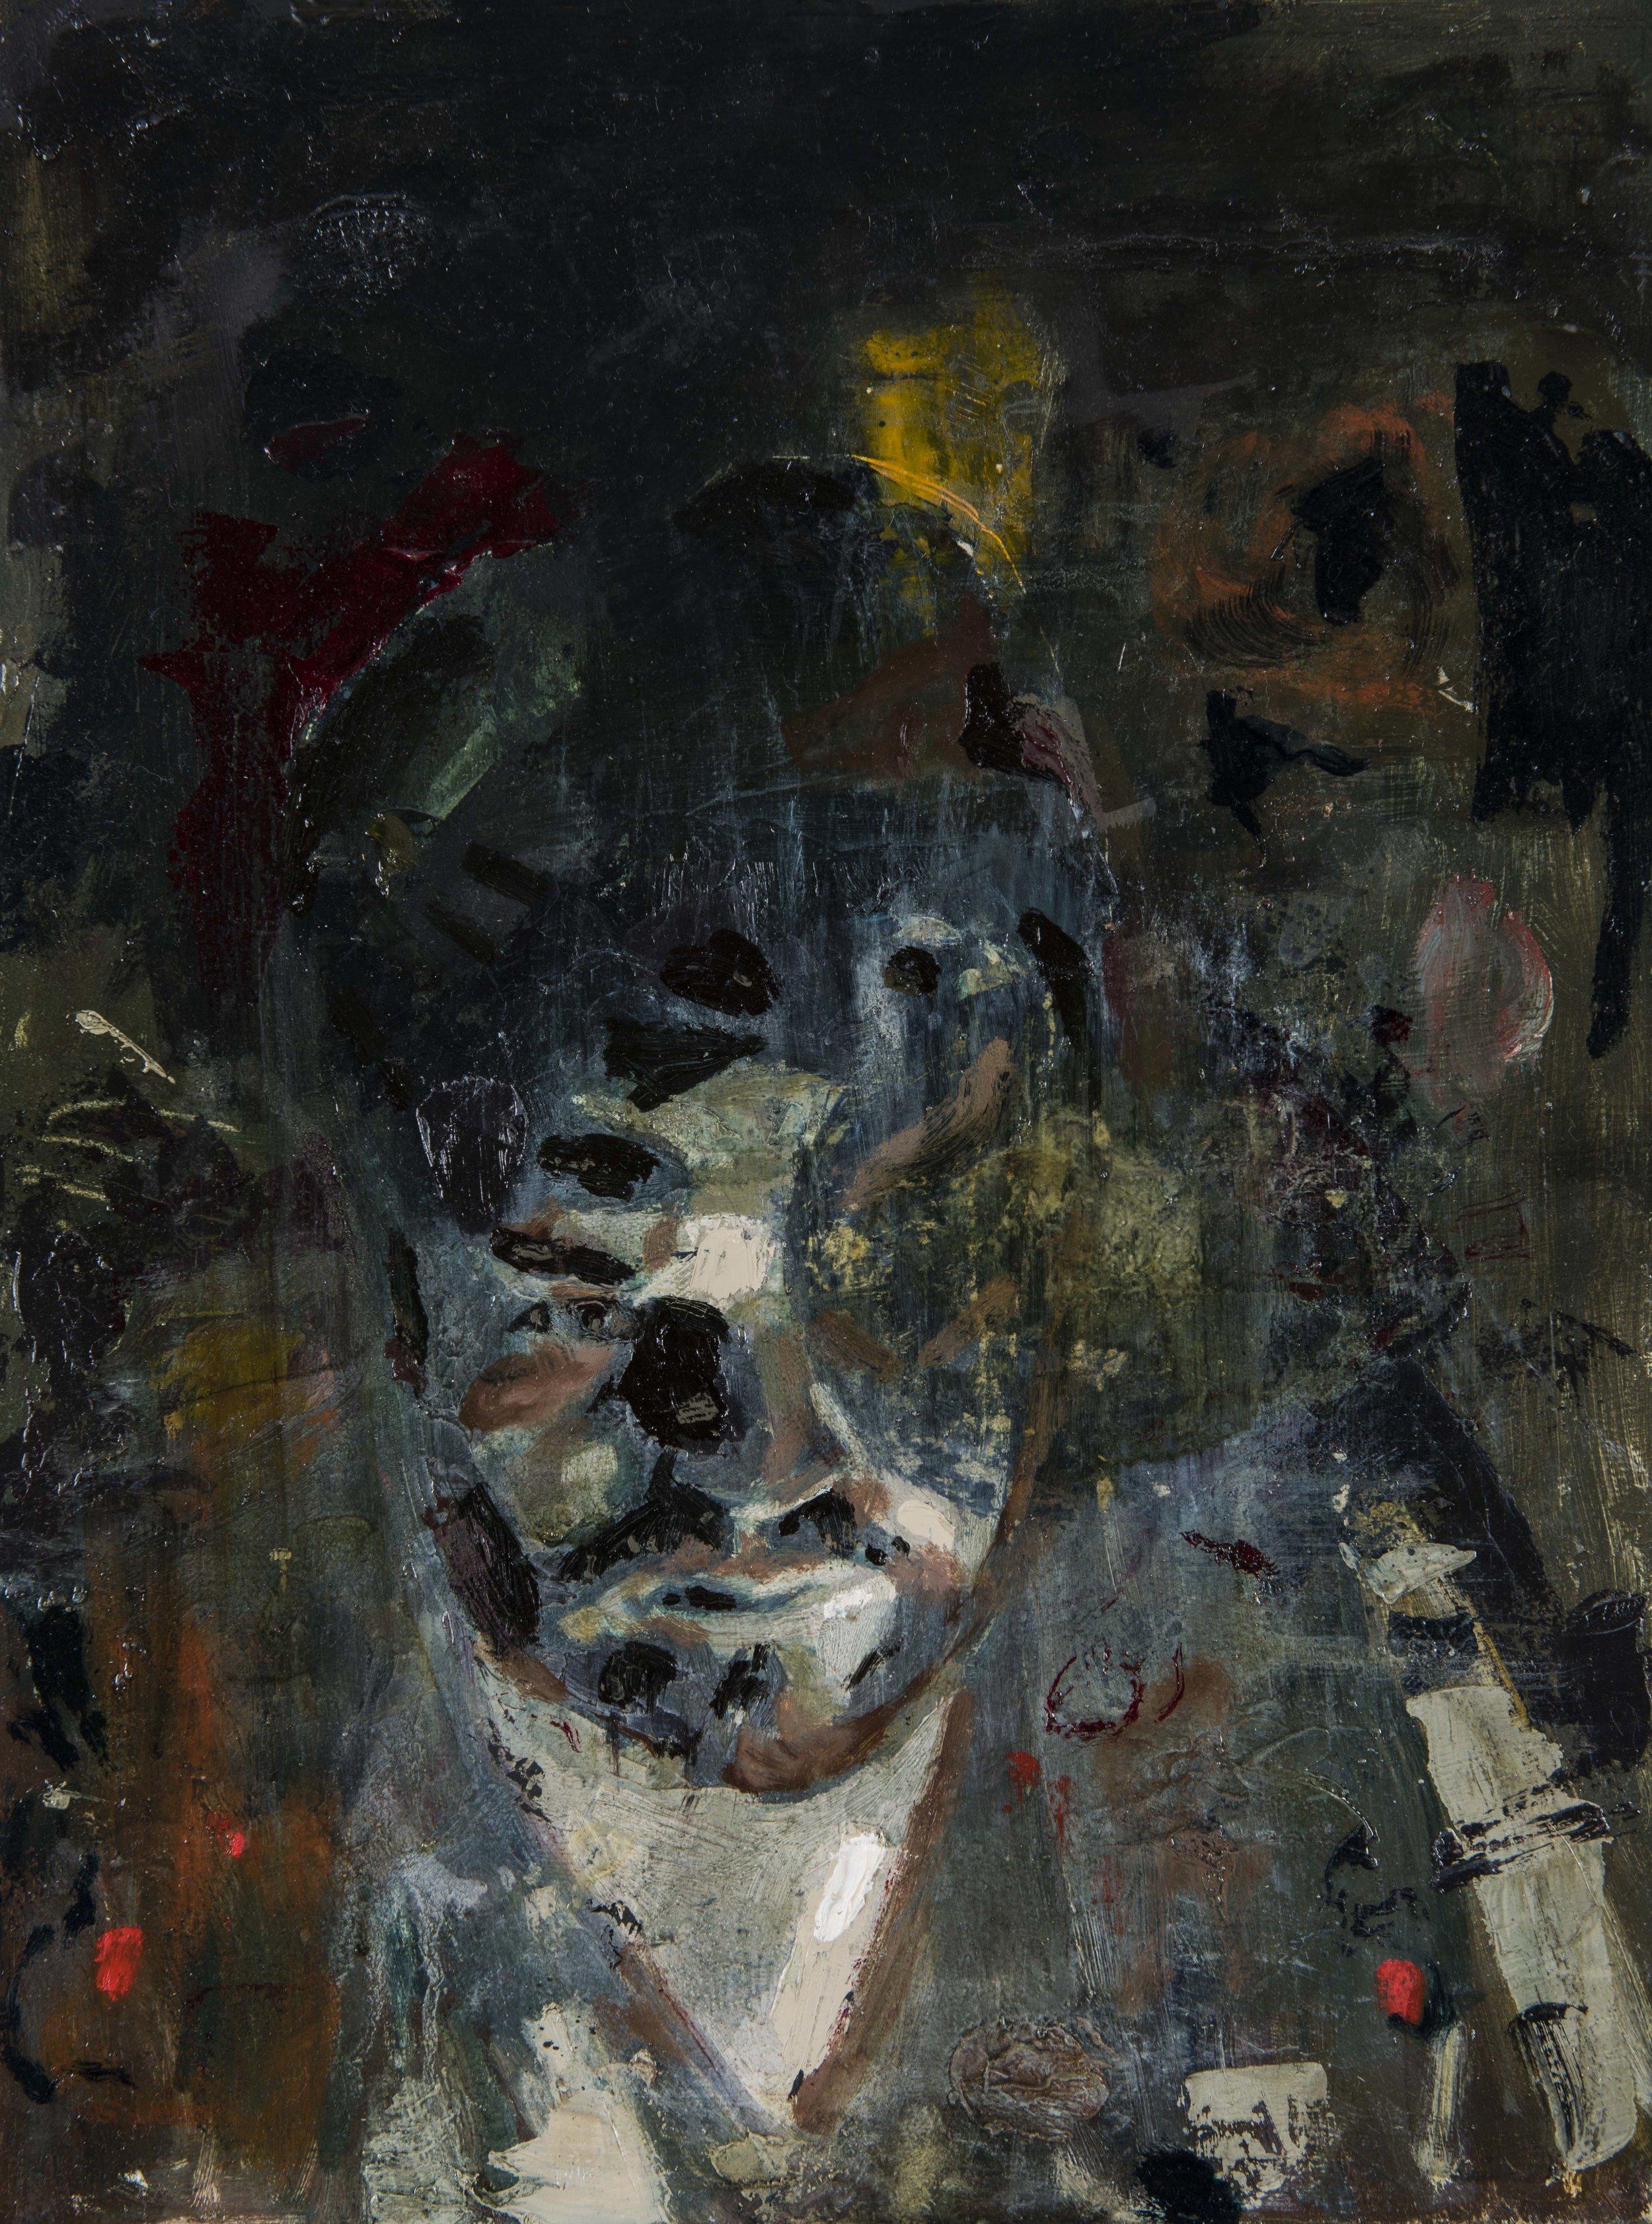 Untitled (self portrait)   oil on wood  12 x 16